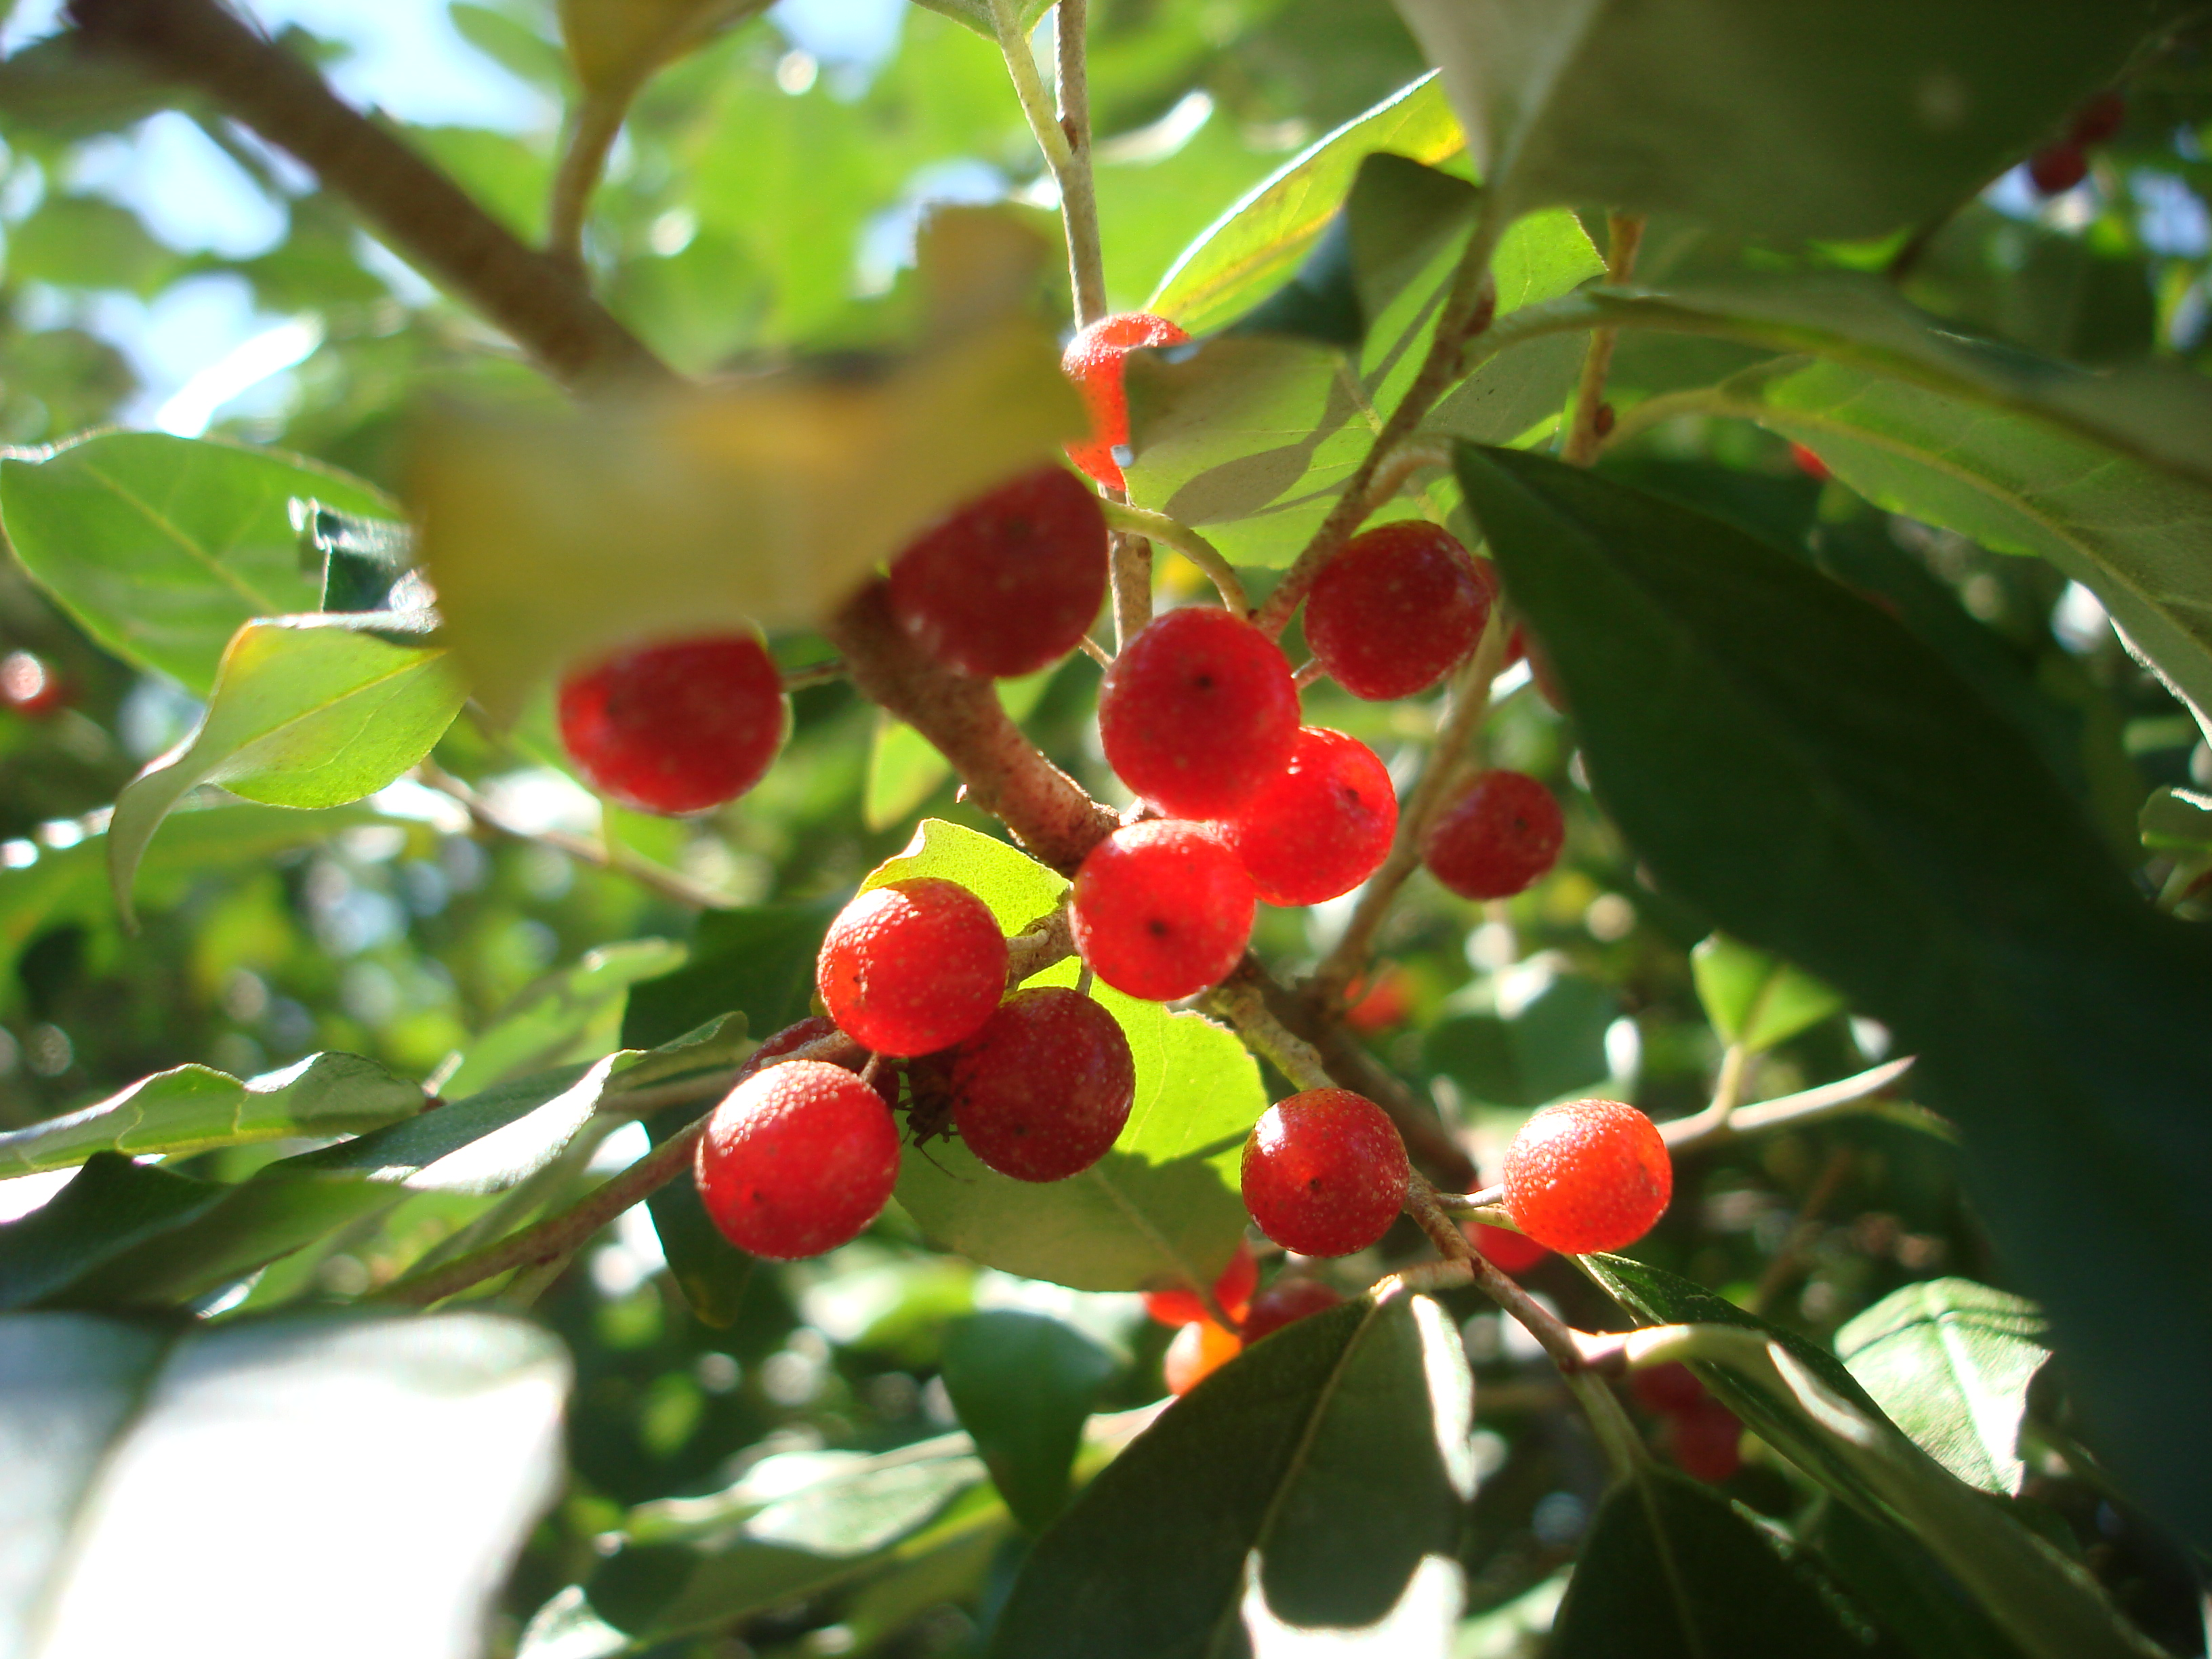 Elaeagnus_umbellata_berries_(1).jpg